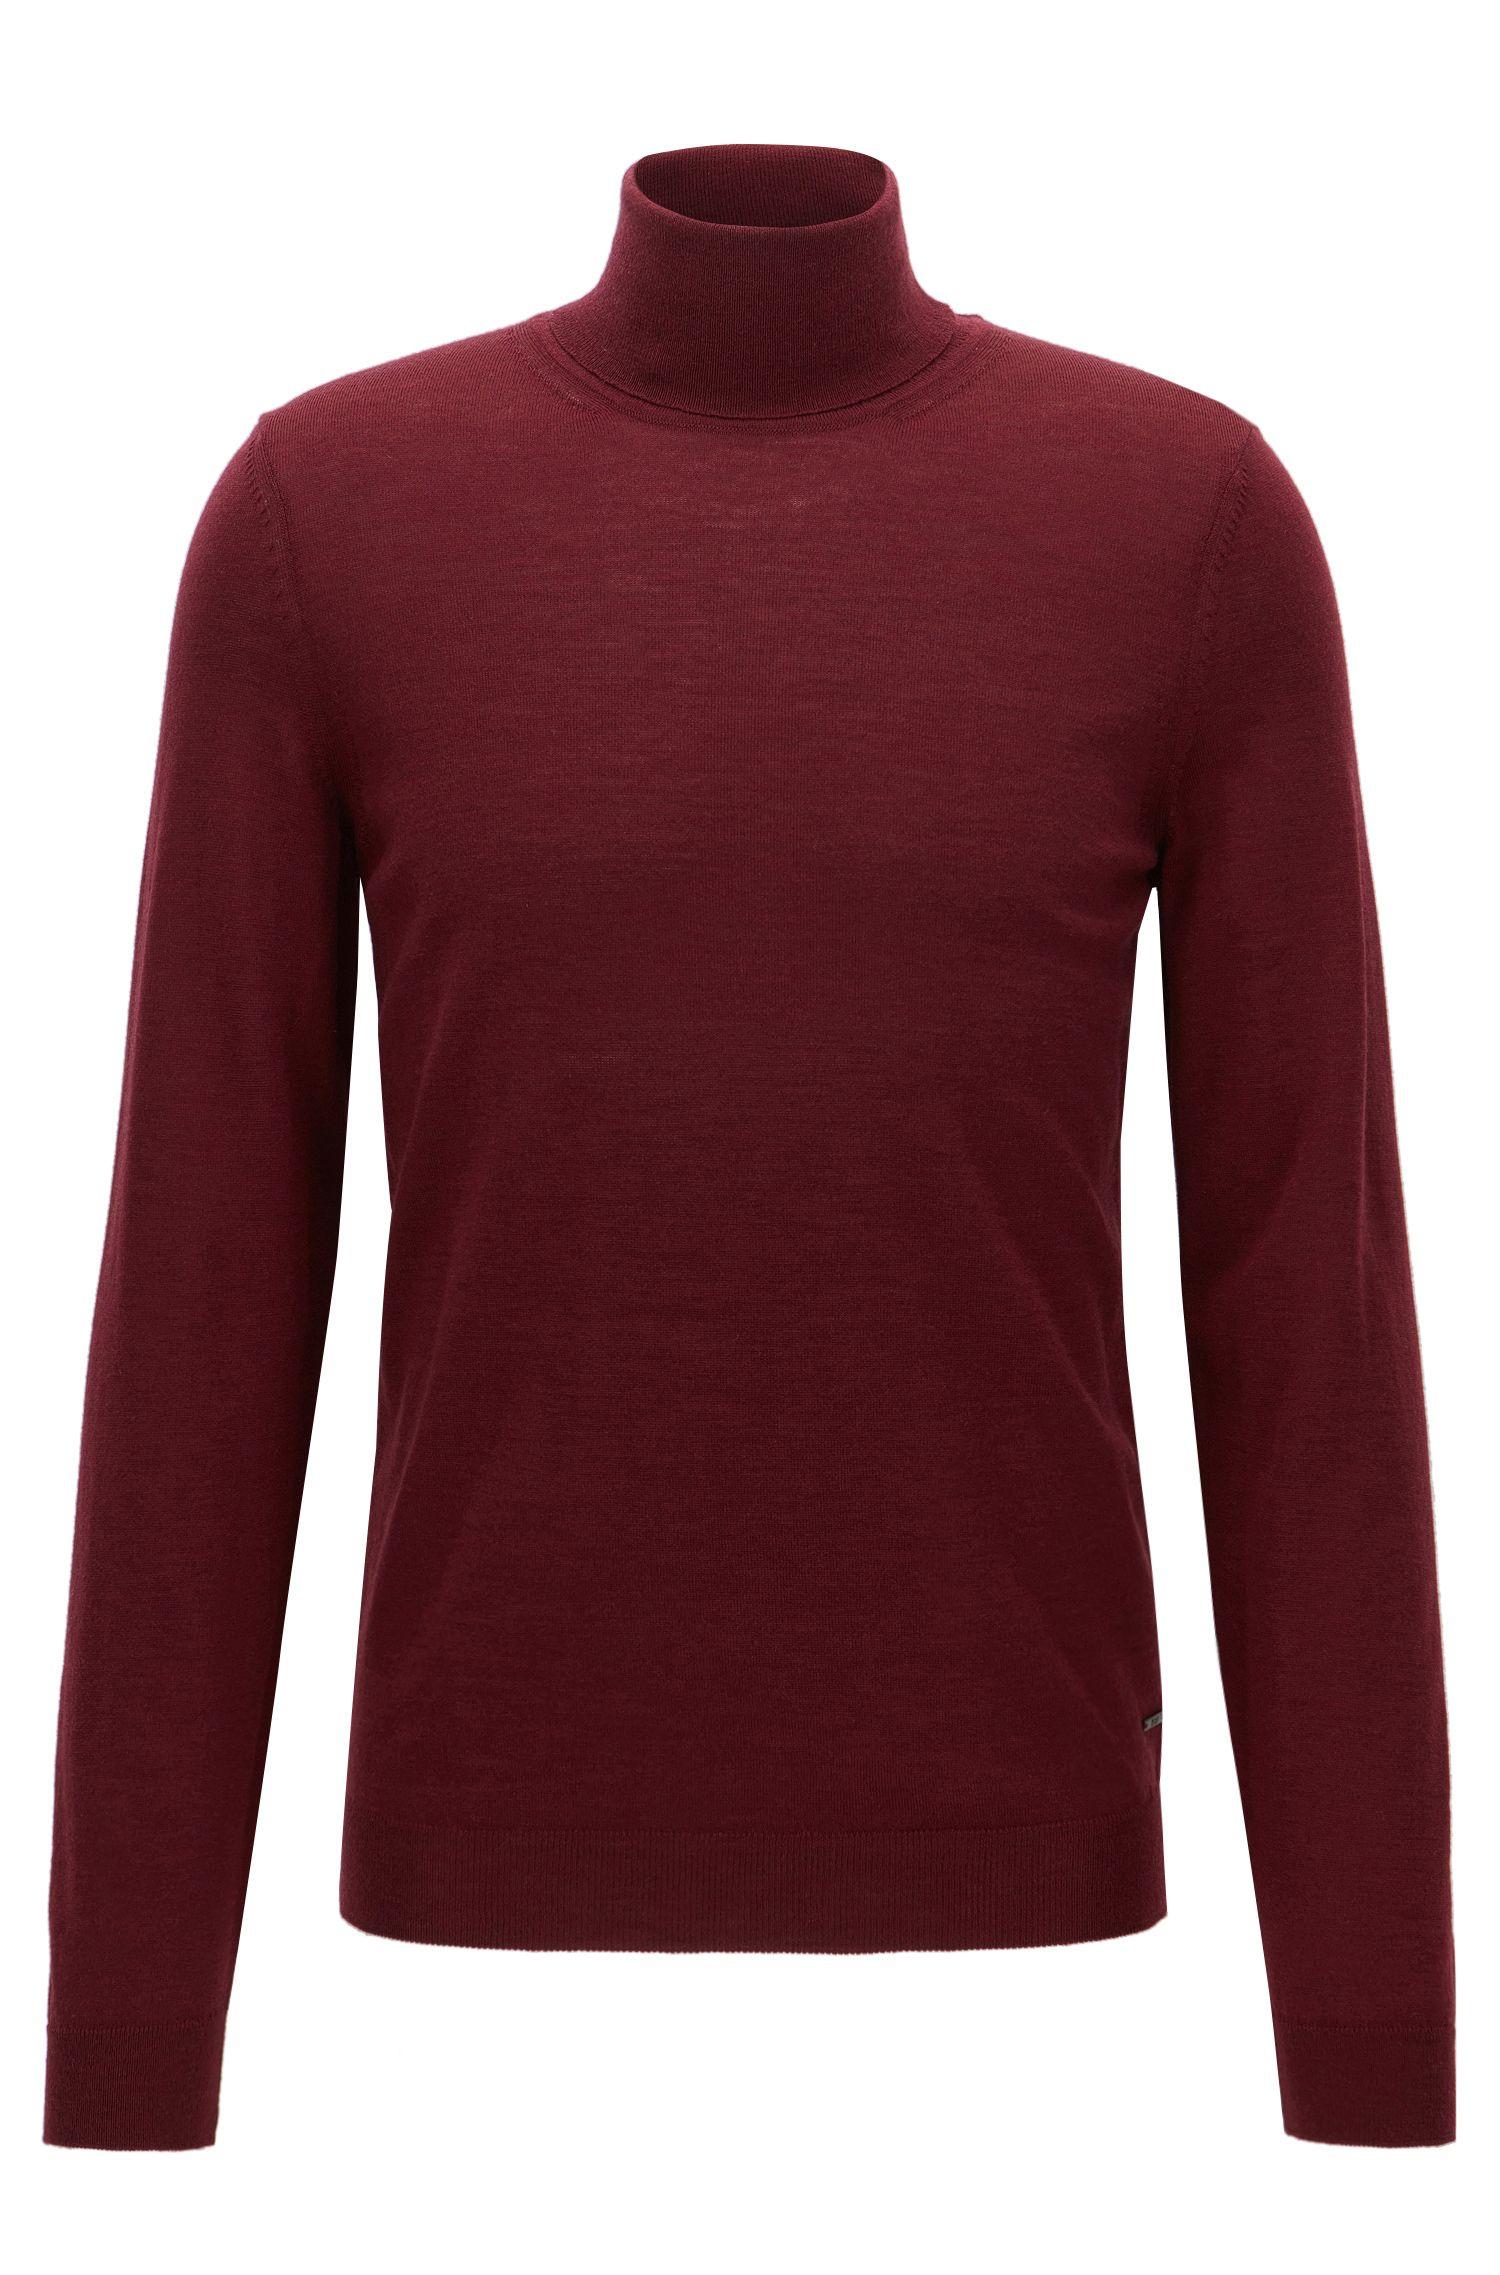 Merino Wool Turtleneck Sweater   Musso N